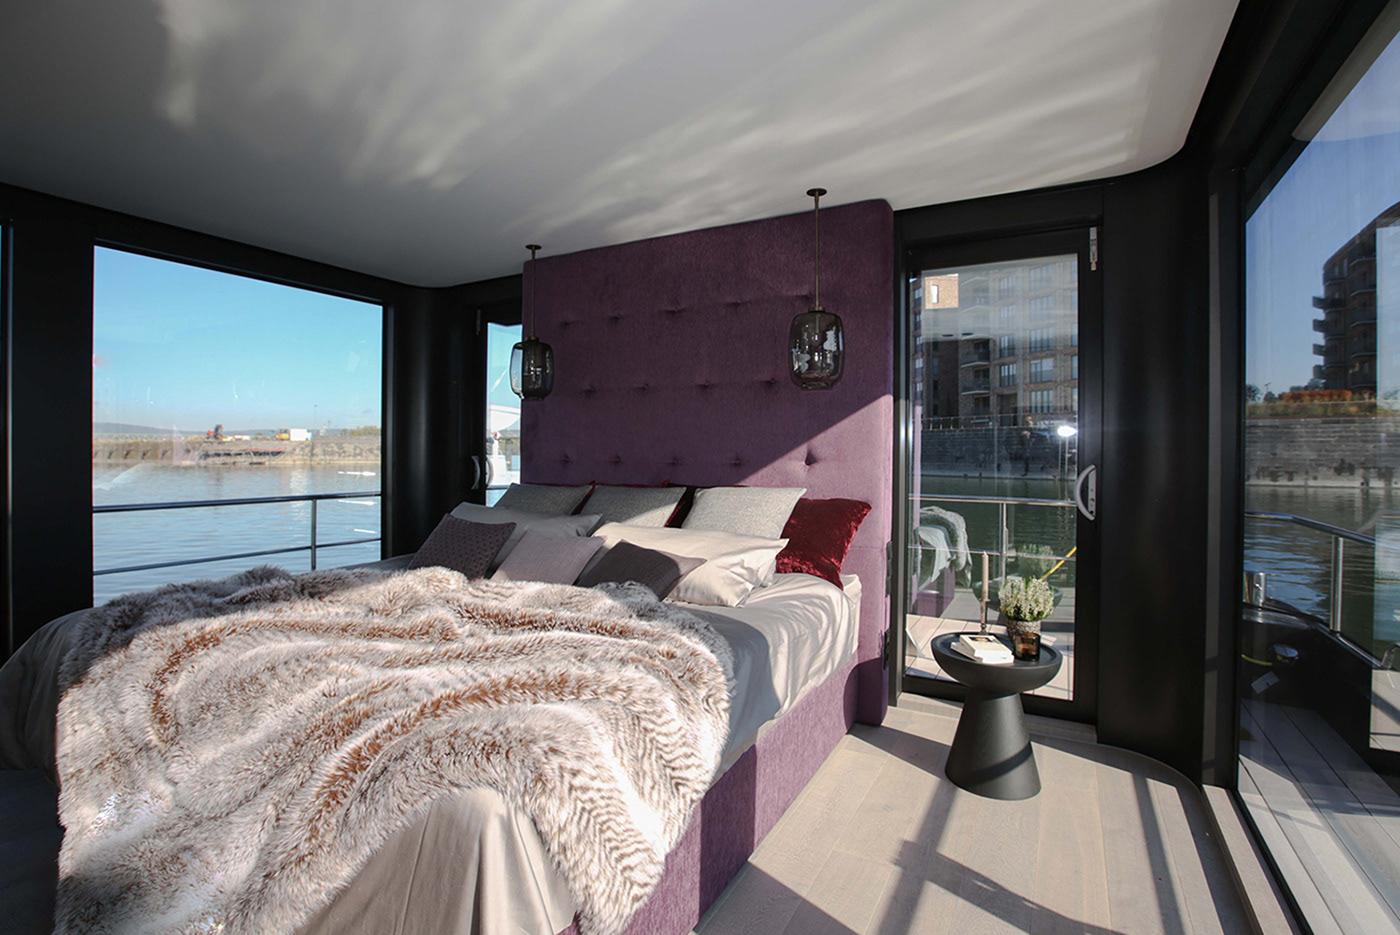 Schlafzimmereinrichtung Onyx Hausboot - Cruising Home Projekt by Nobla Karlsruhe